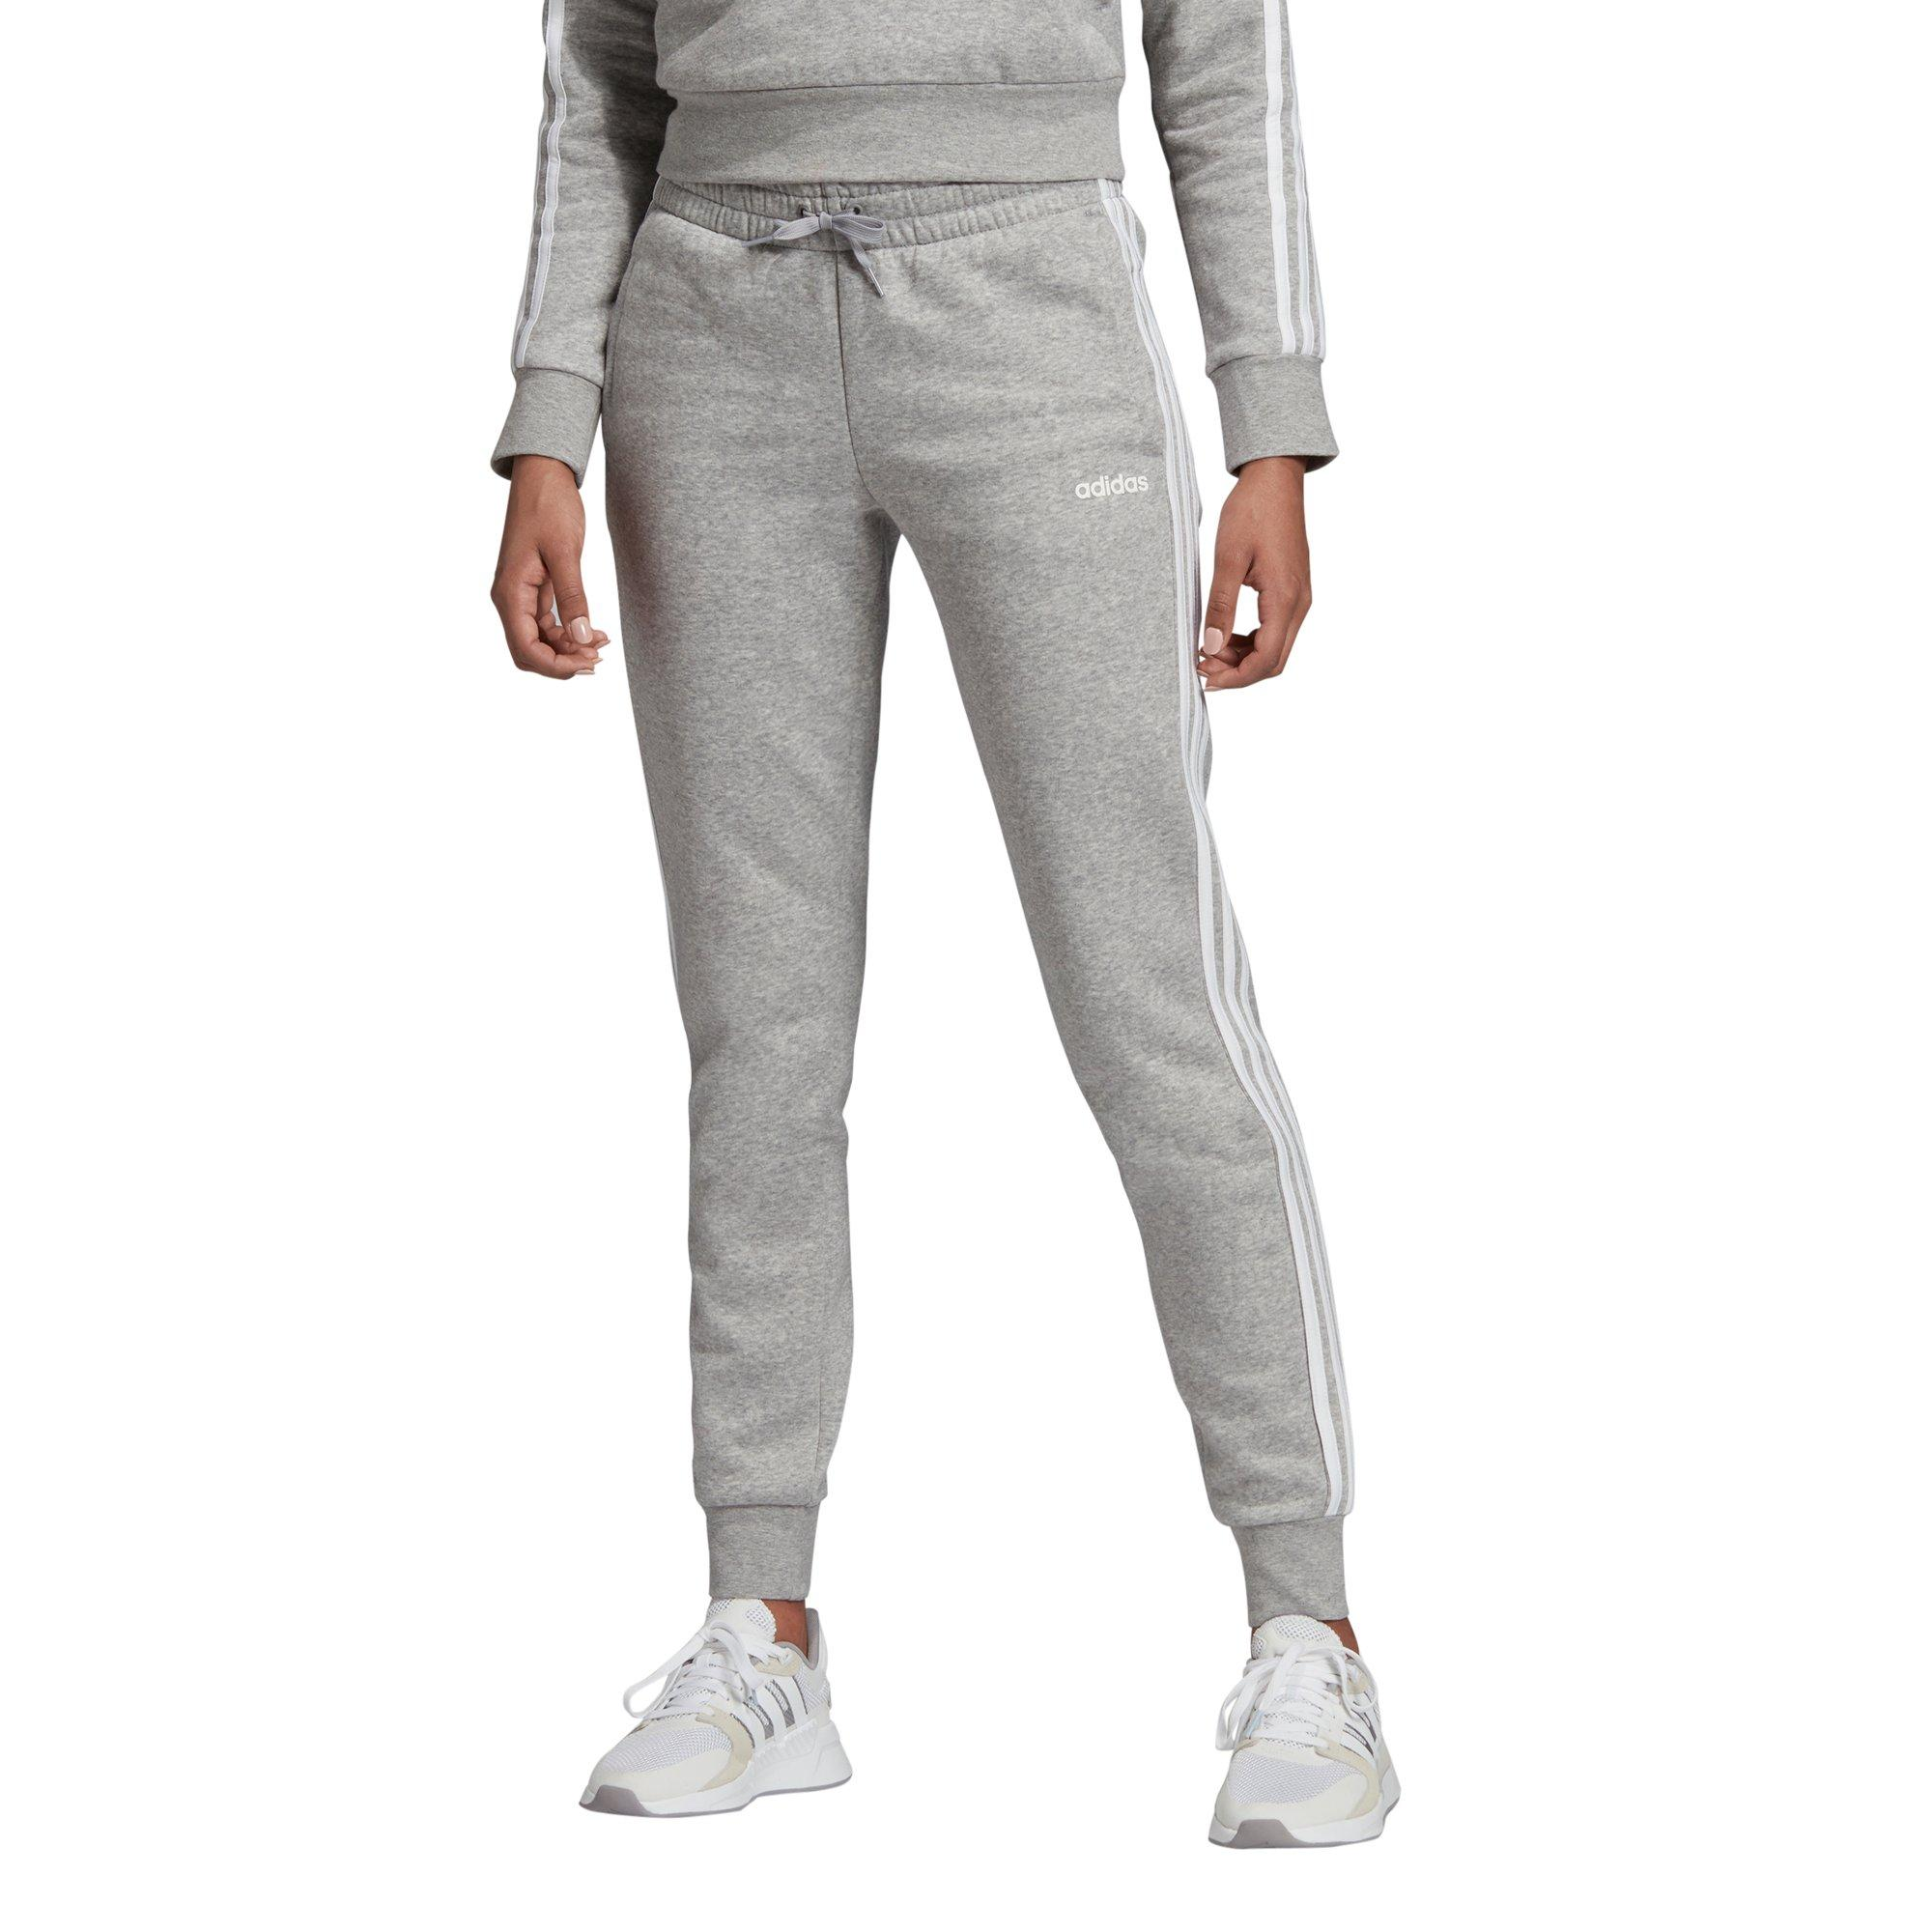 adidas Women's Essentials 3 Stripe Joggers